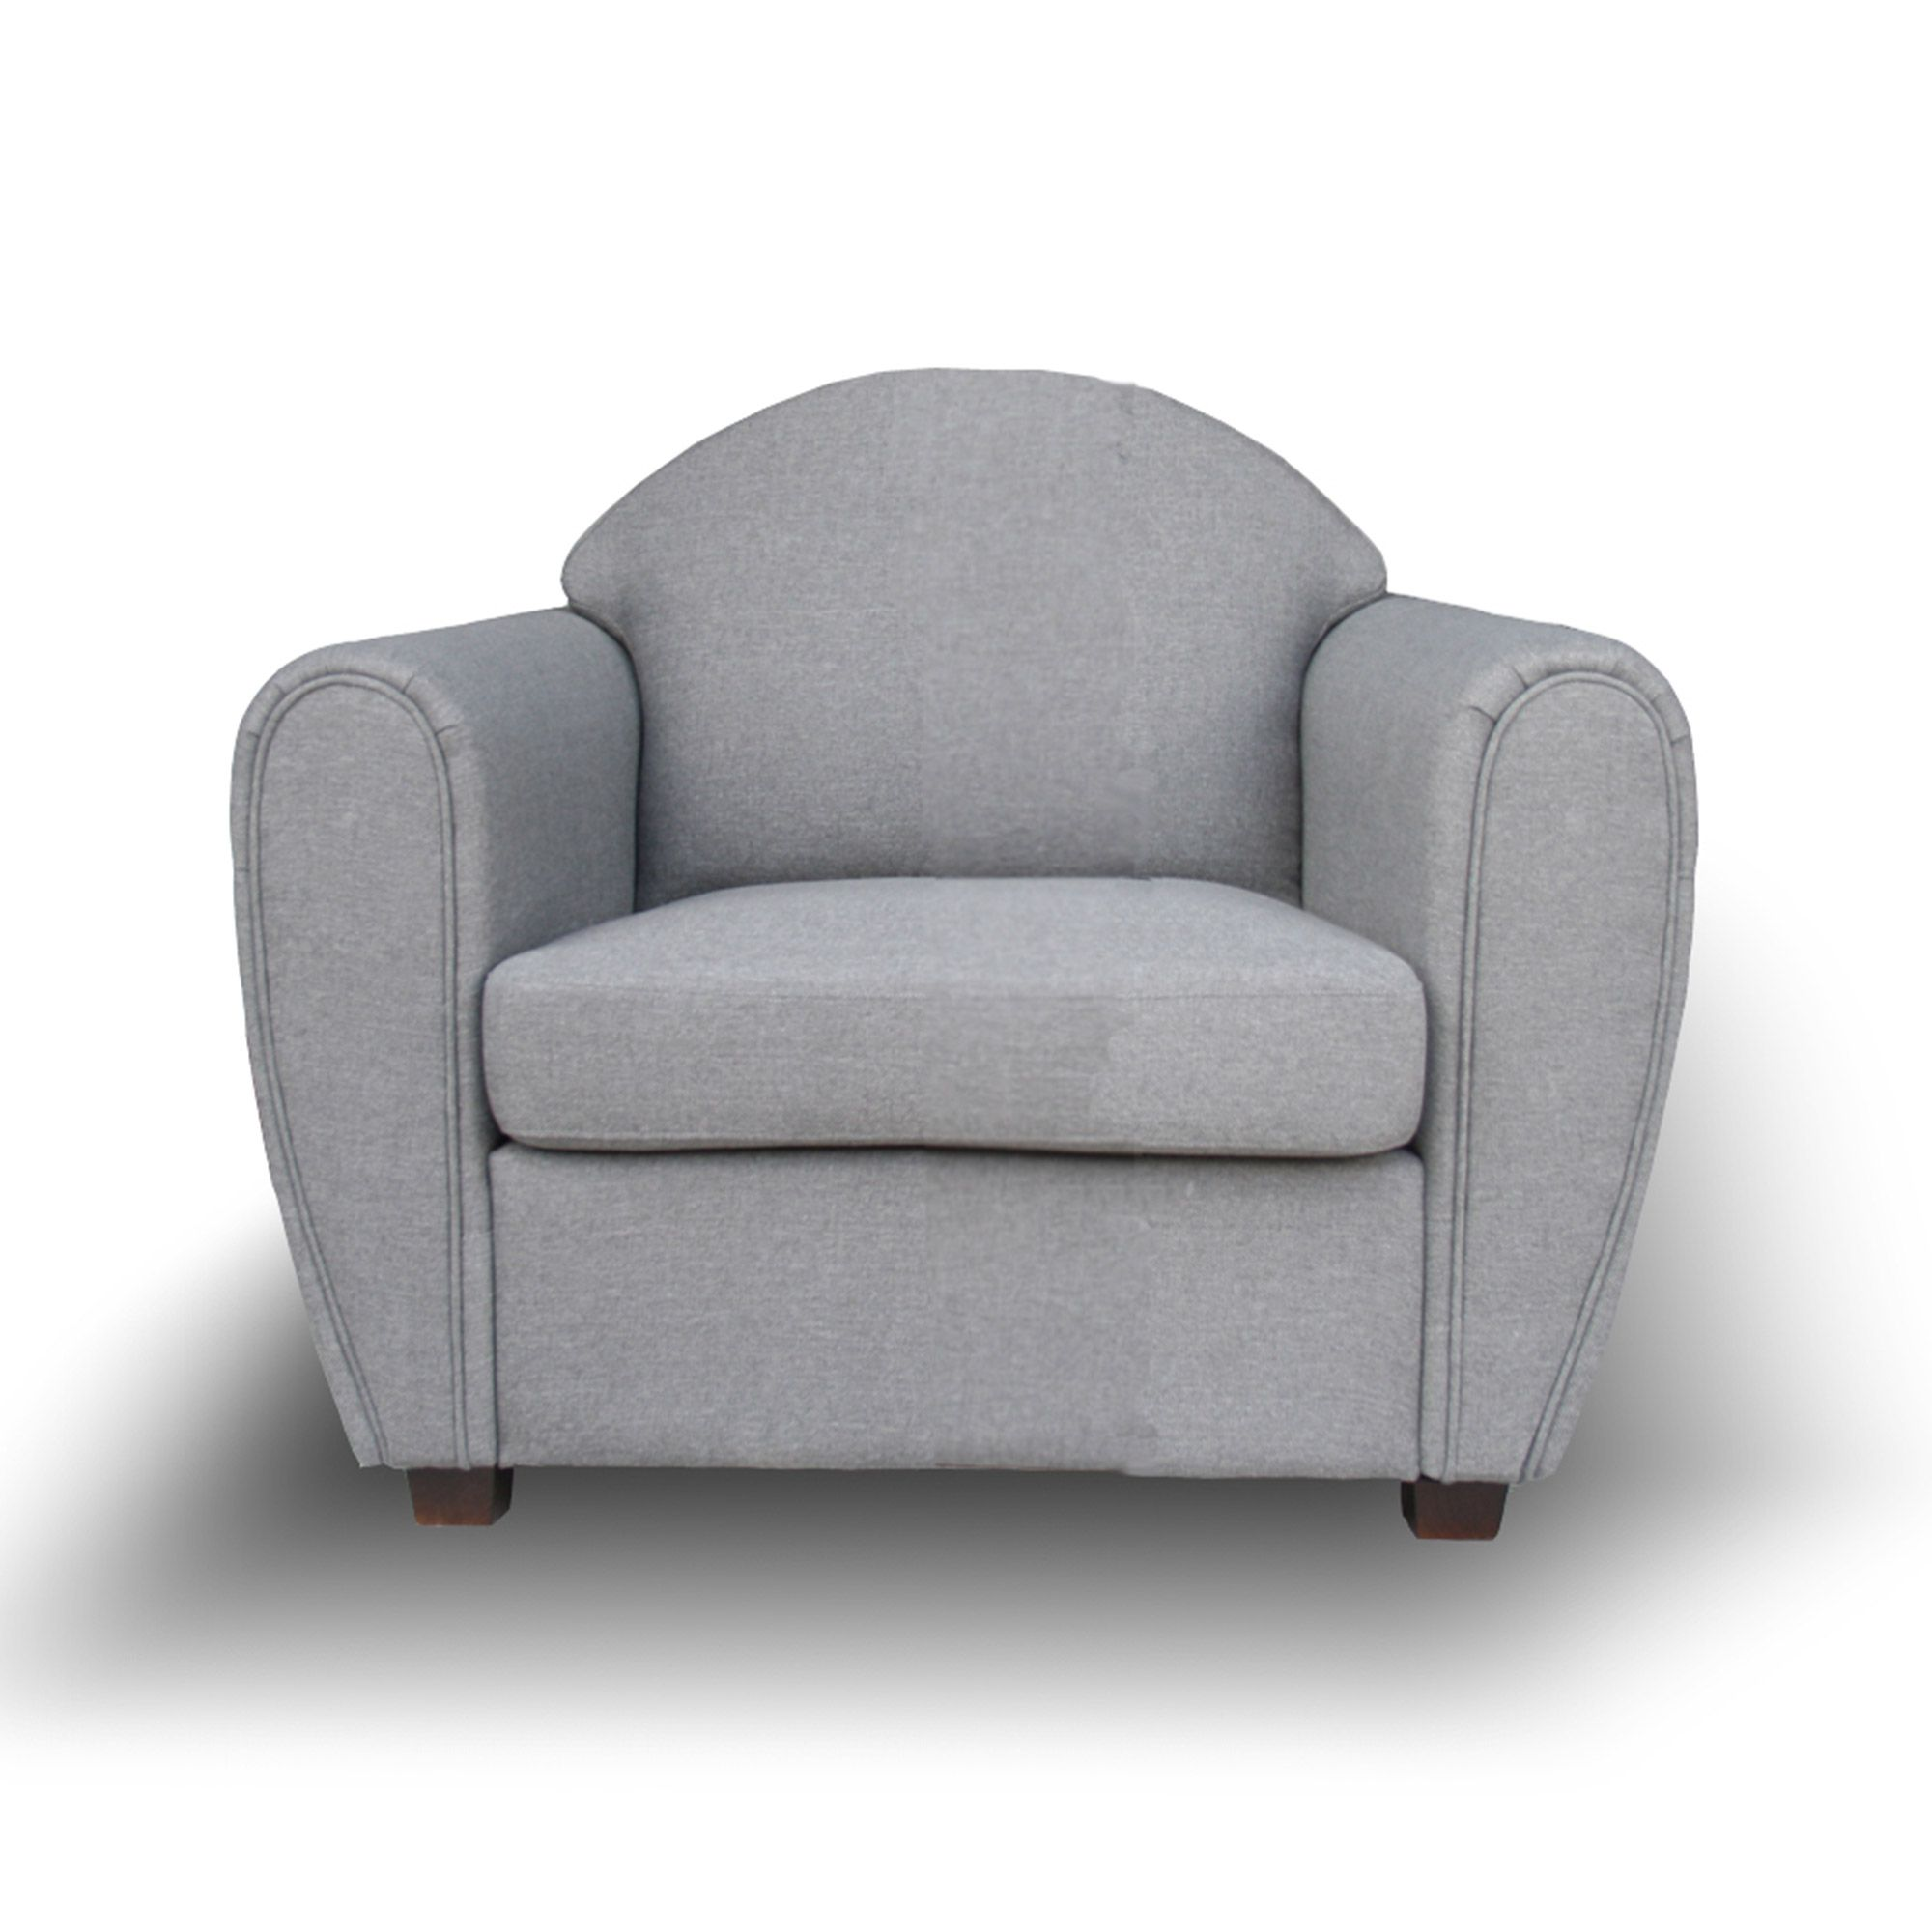 fauteuil club tissu gris clair western port offert vente priv e la baraque pinterest. Black Bedroom Furniture Sets. Home Design Ideas